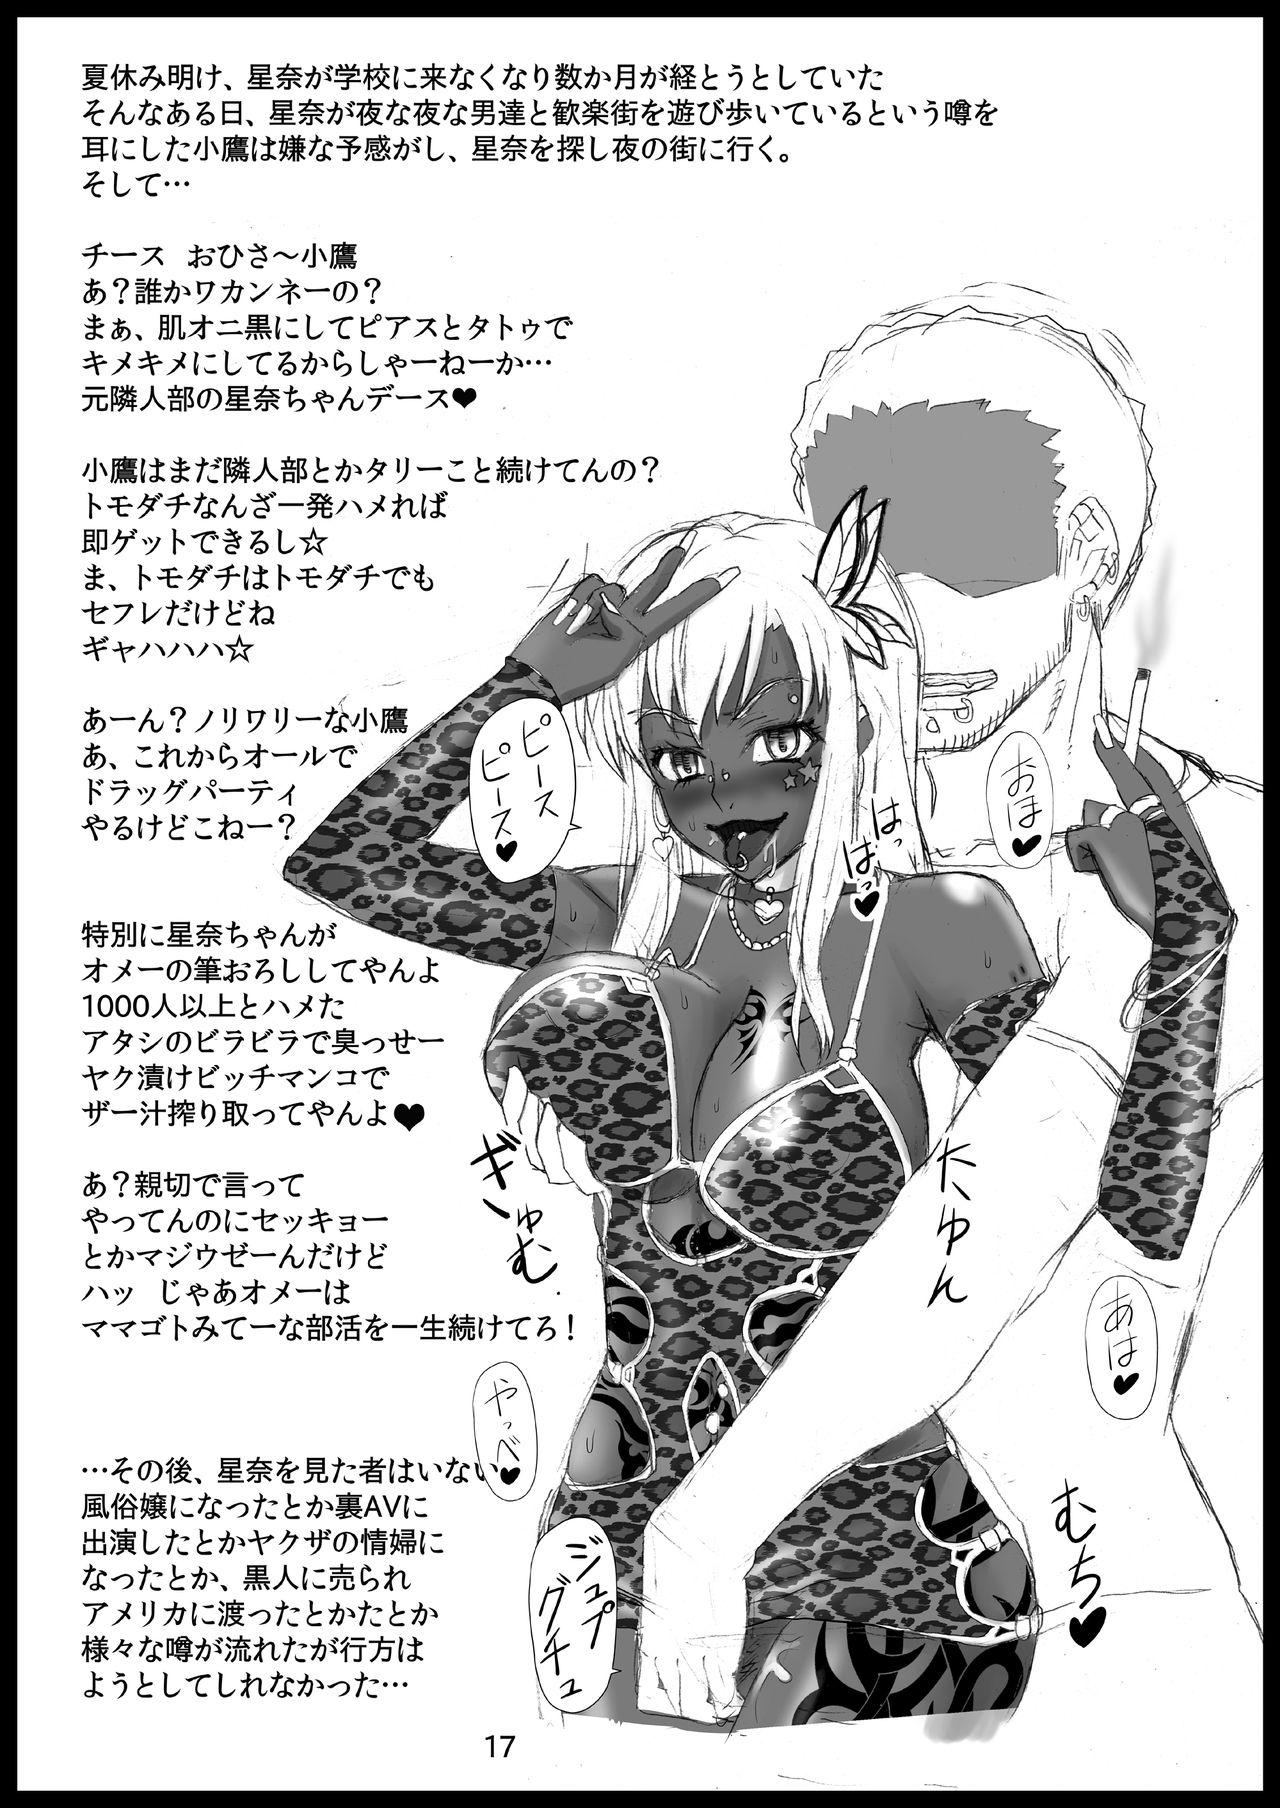 Kusurizuke! Sennou! Kikai Kaizou! Kuroochi Bitch-ka Heroine +α 180